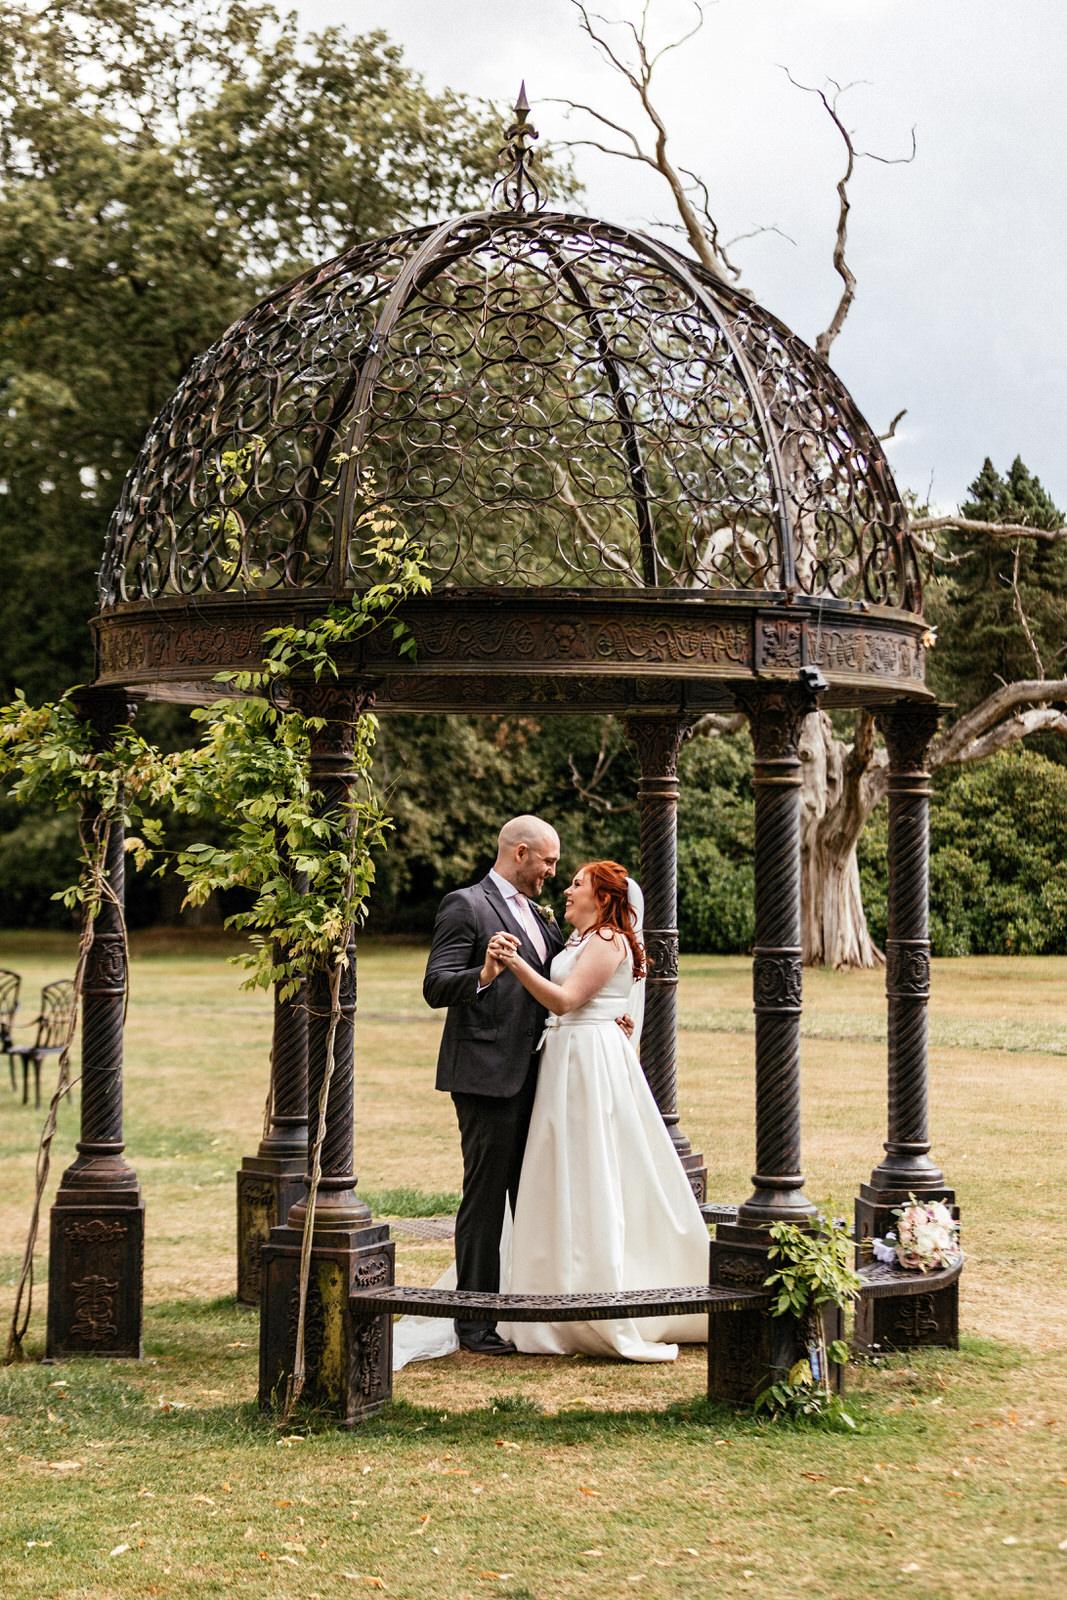 Beamish-Hall-Wedding-Photographer-049.jpg